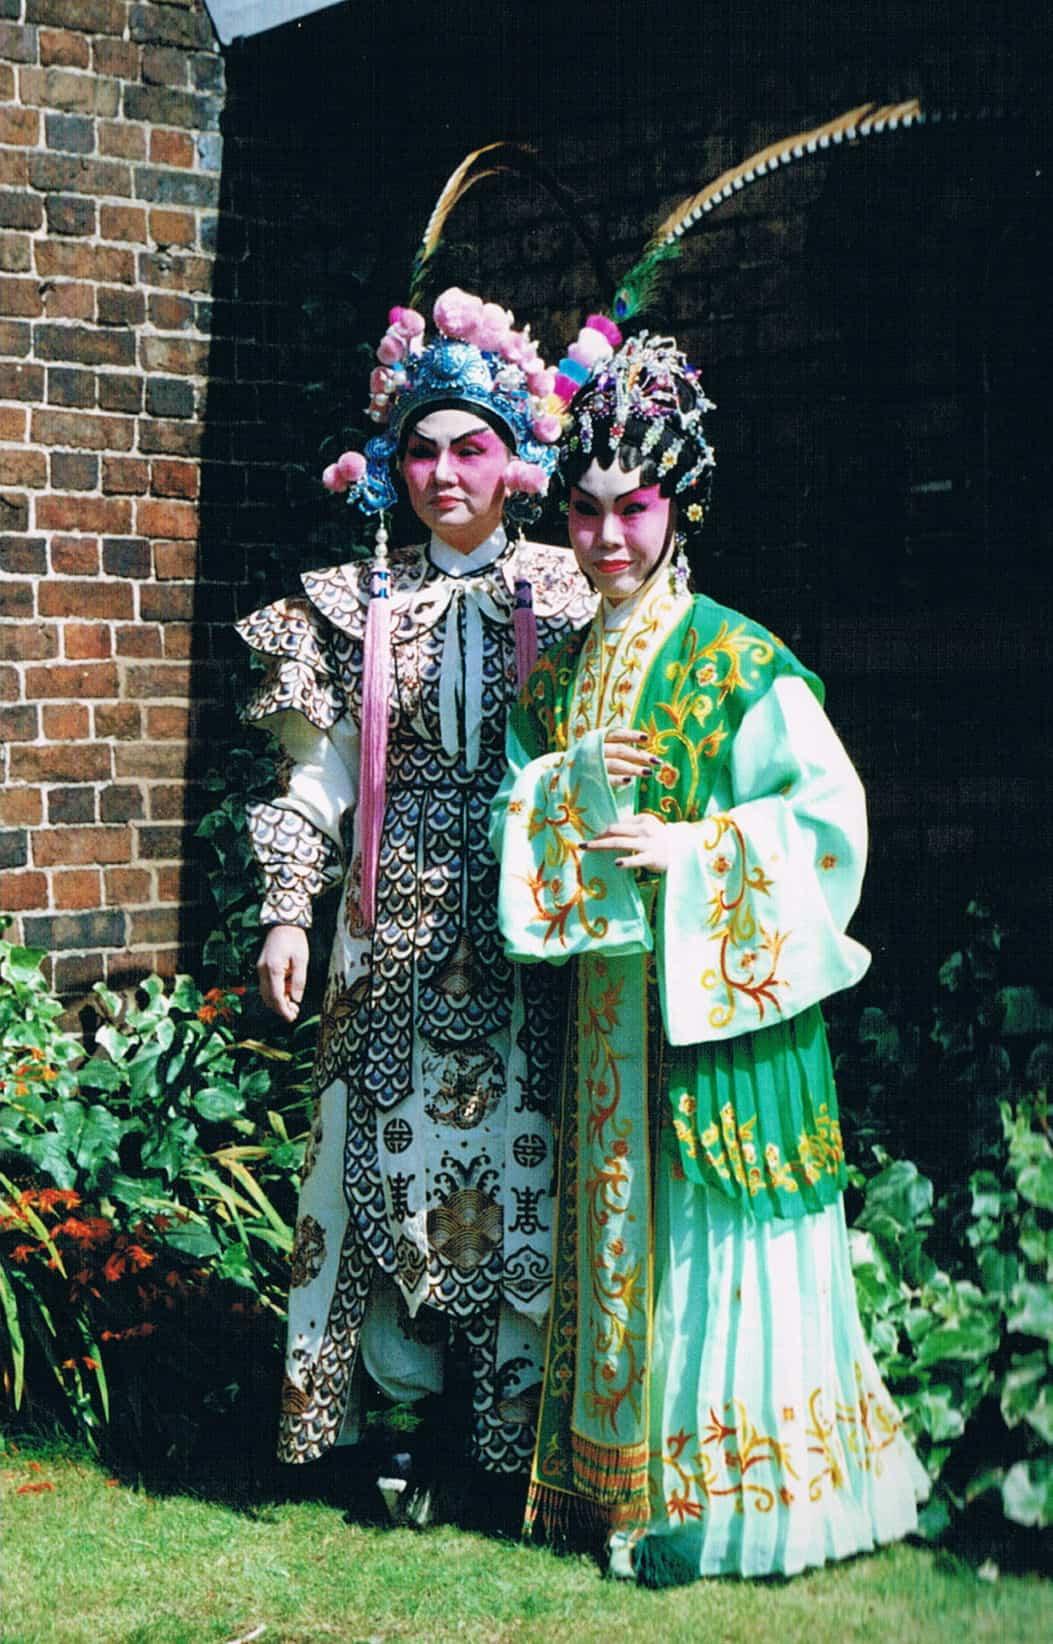 Lye Carnival 2000 Peking Opera